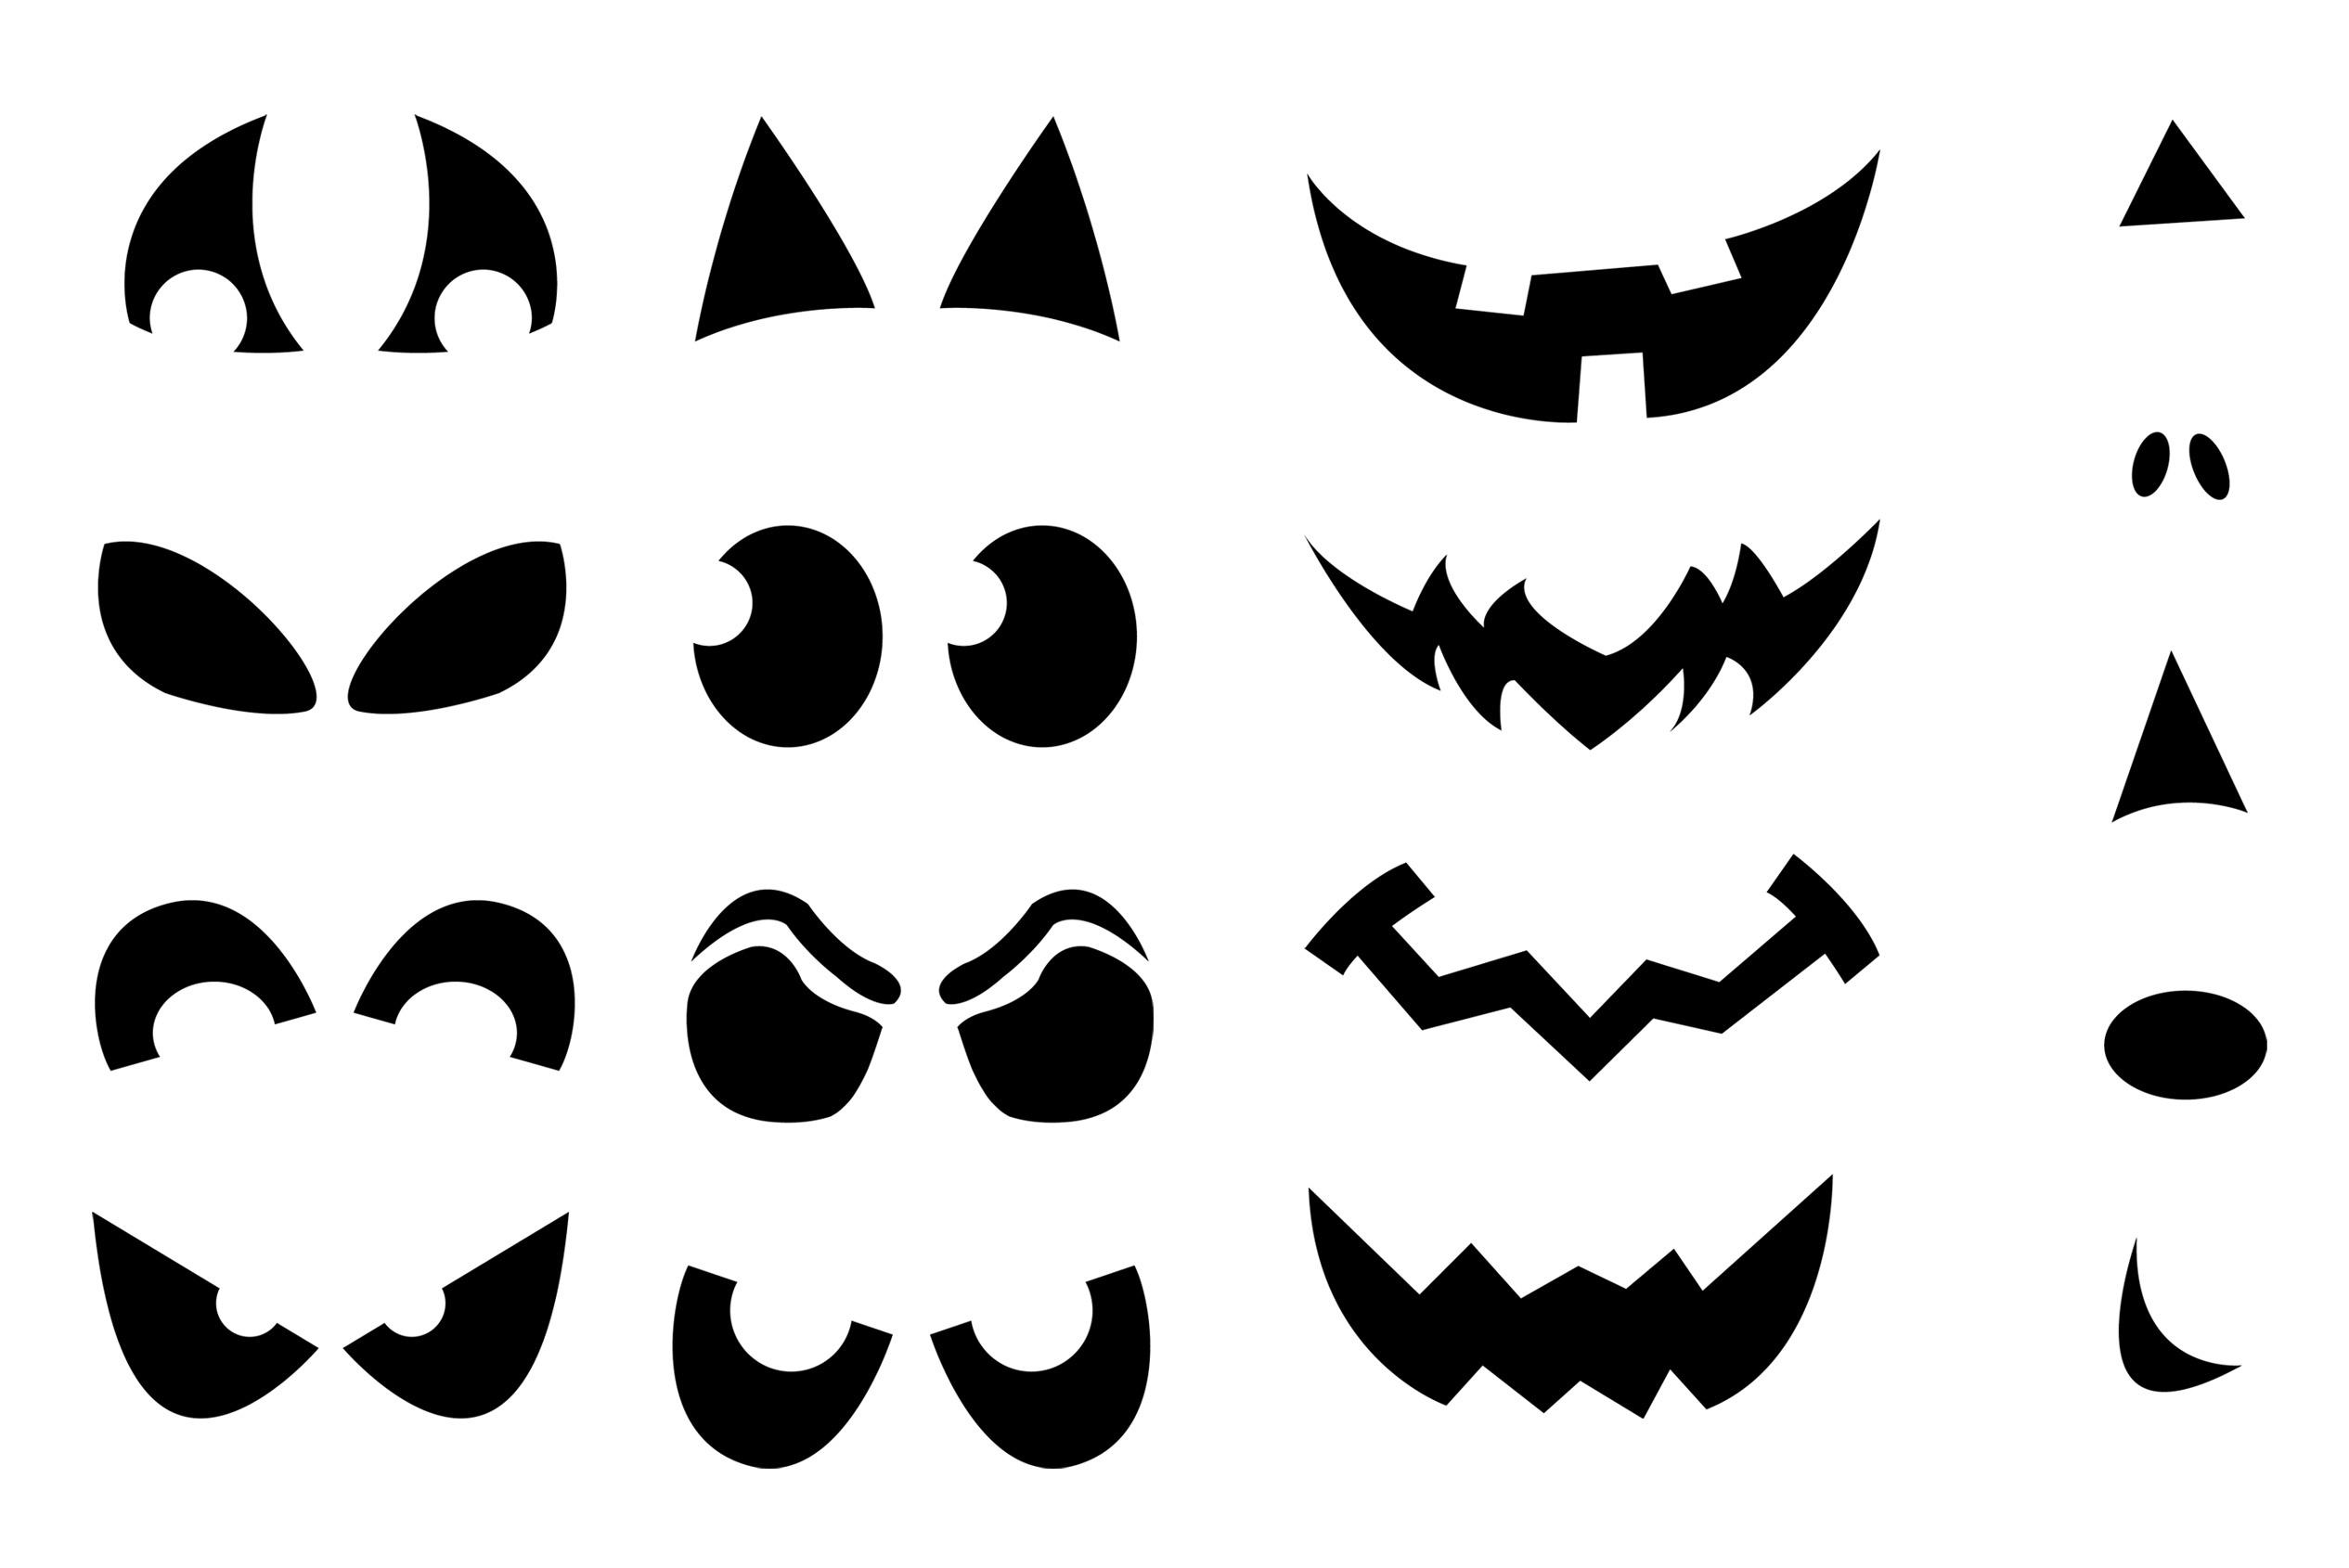 Jack-O'-Lantern Shirt Stencils | Craft Buds - Jack O Lantern Templates Printable Free